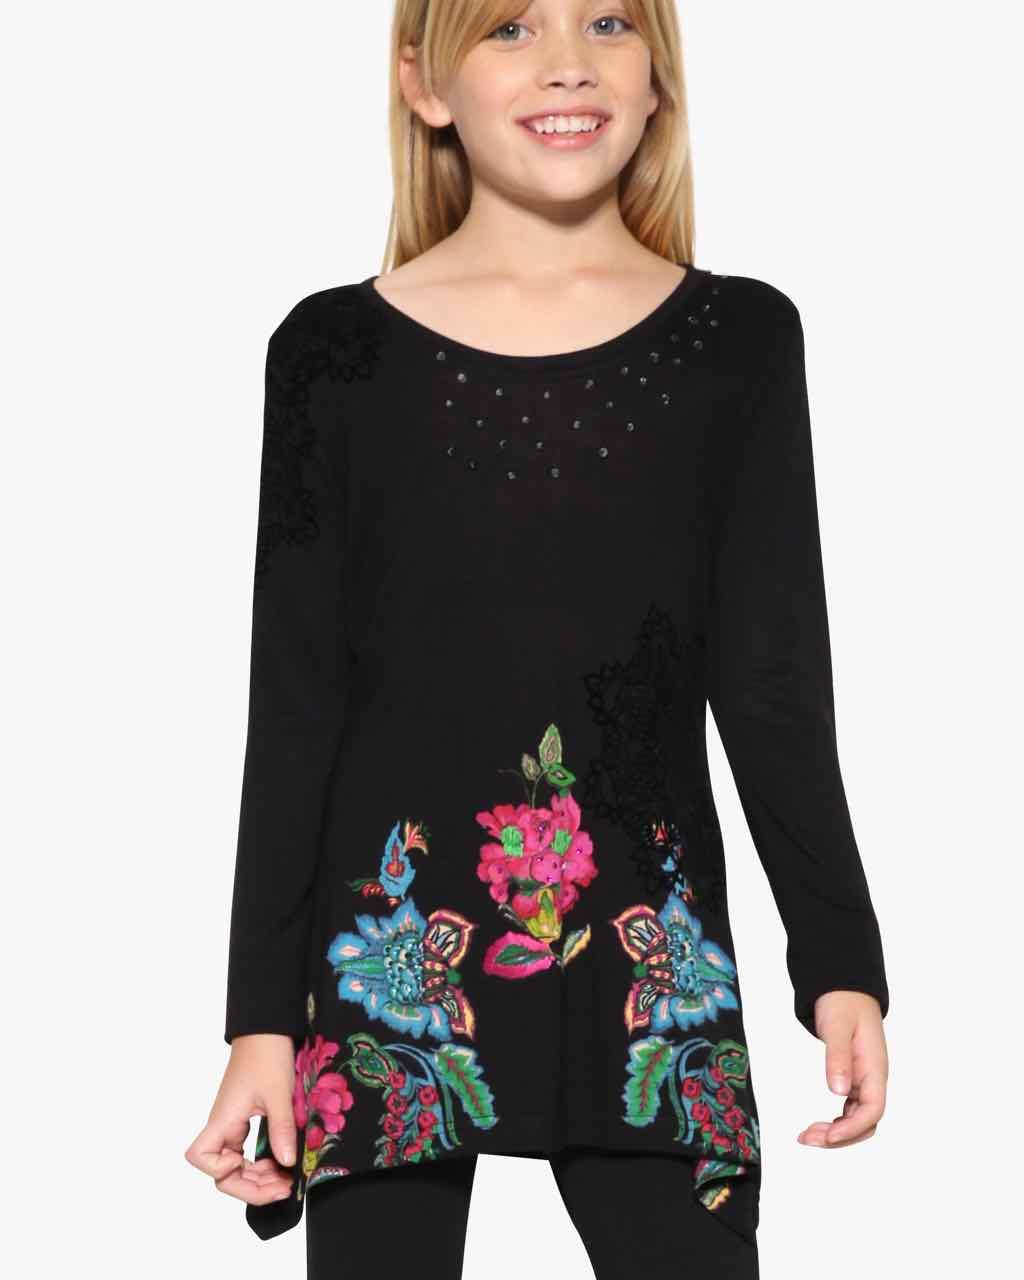 17WGTK08_2000 Desigual Girls T-Shirt Delawere Buy Online